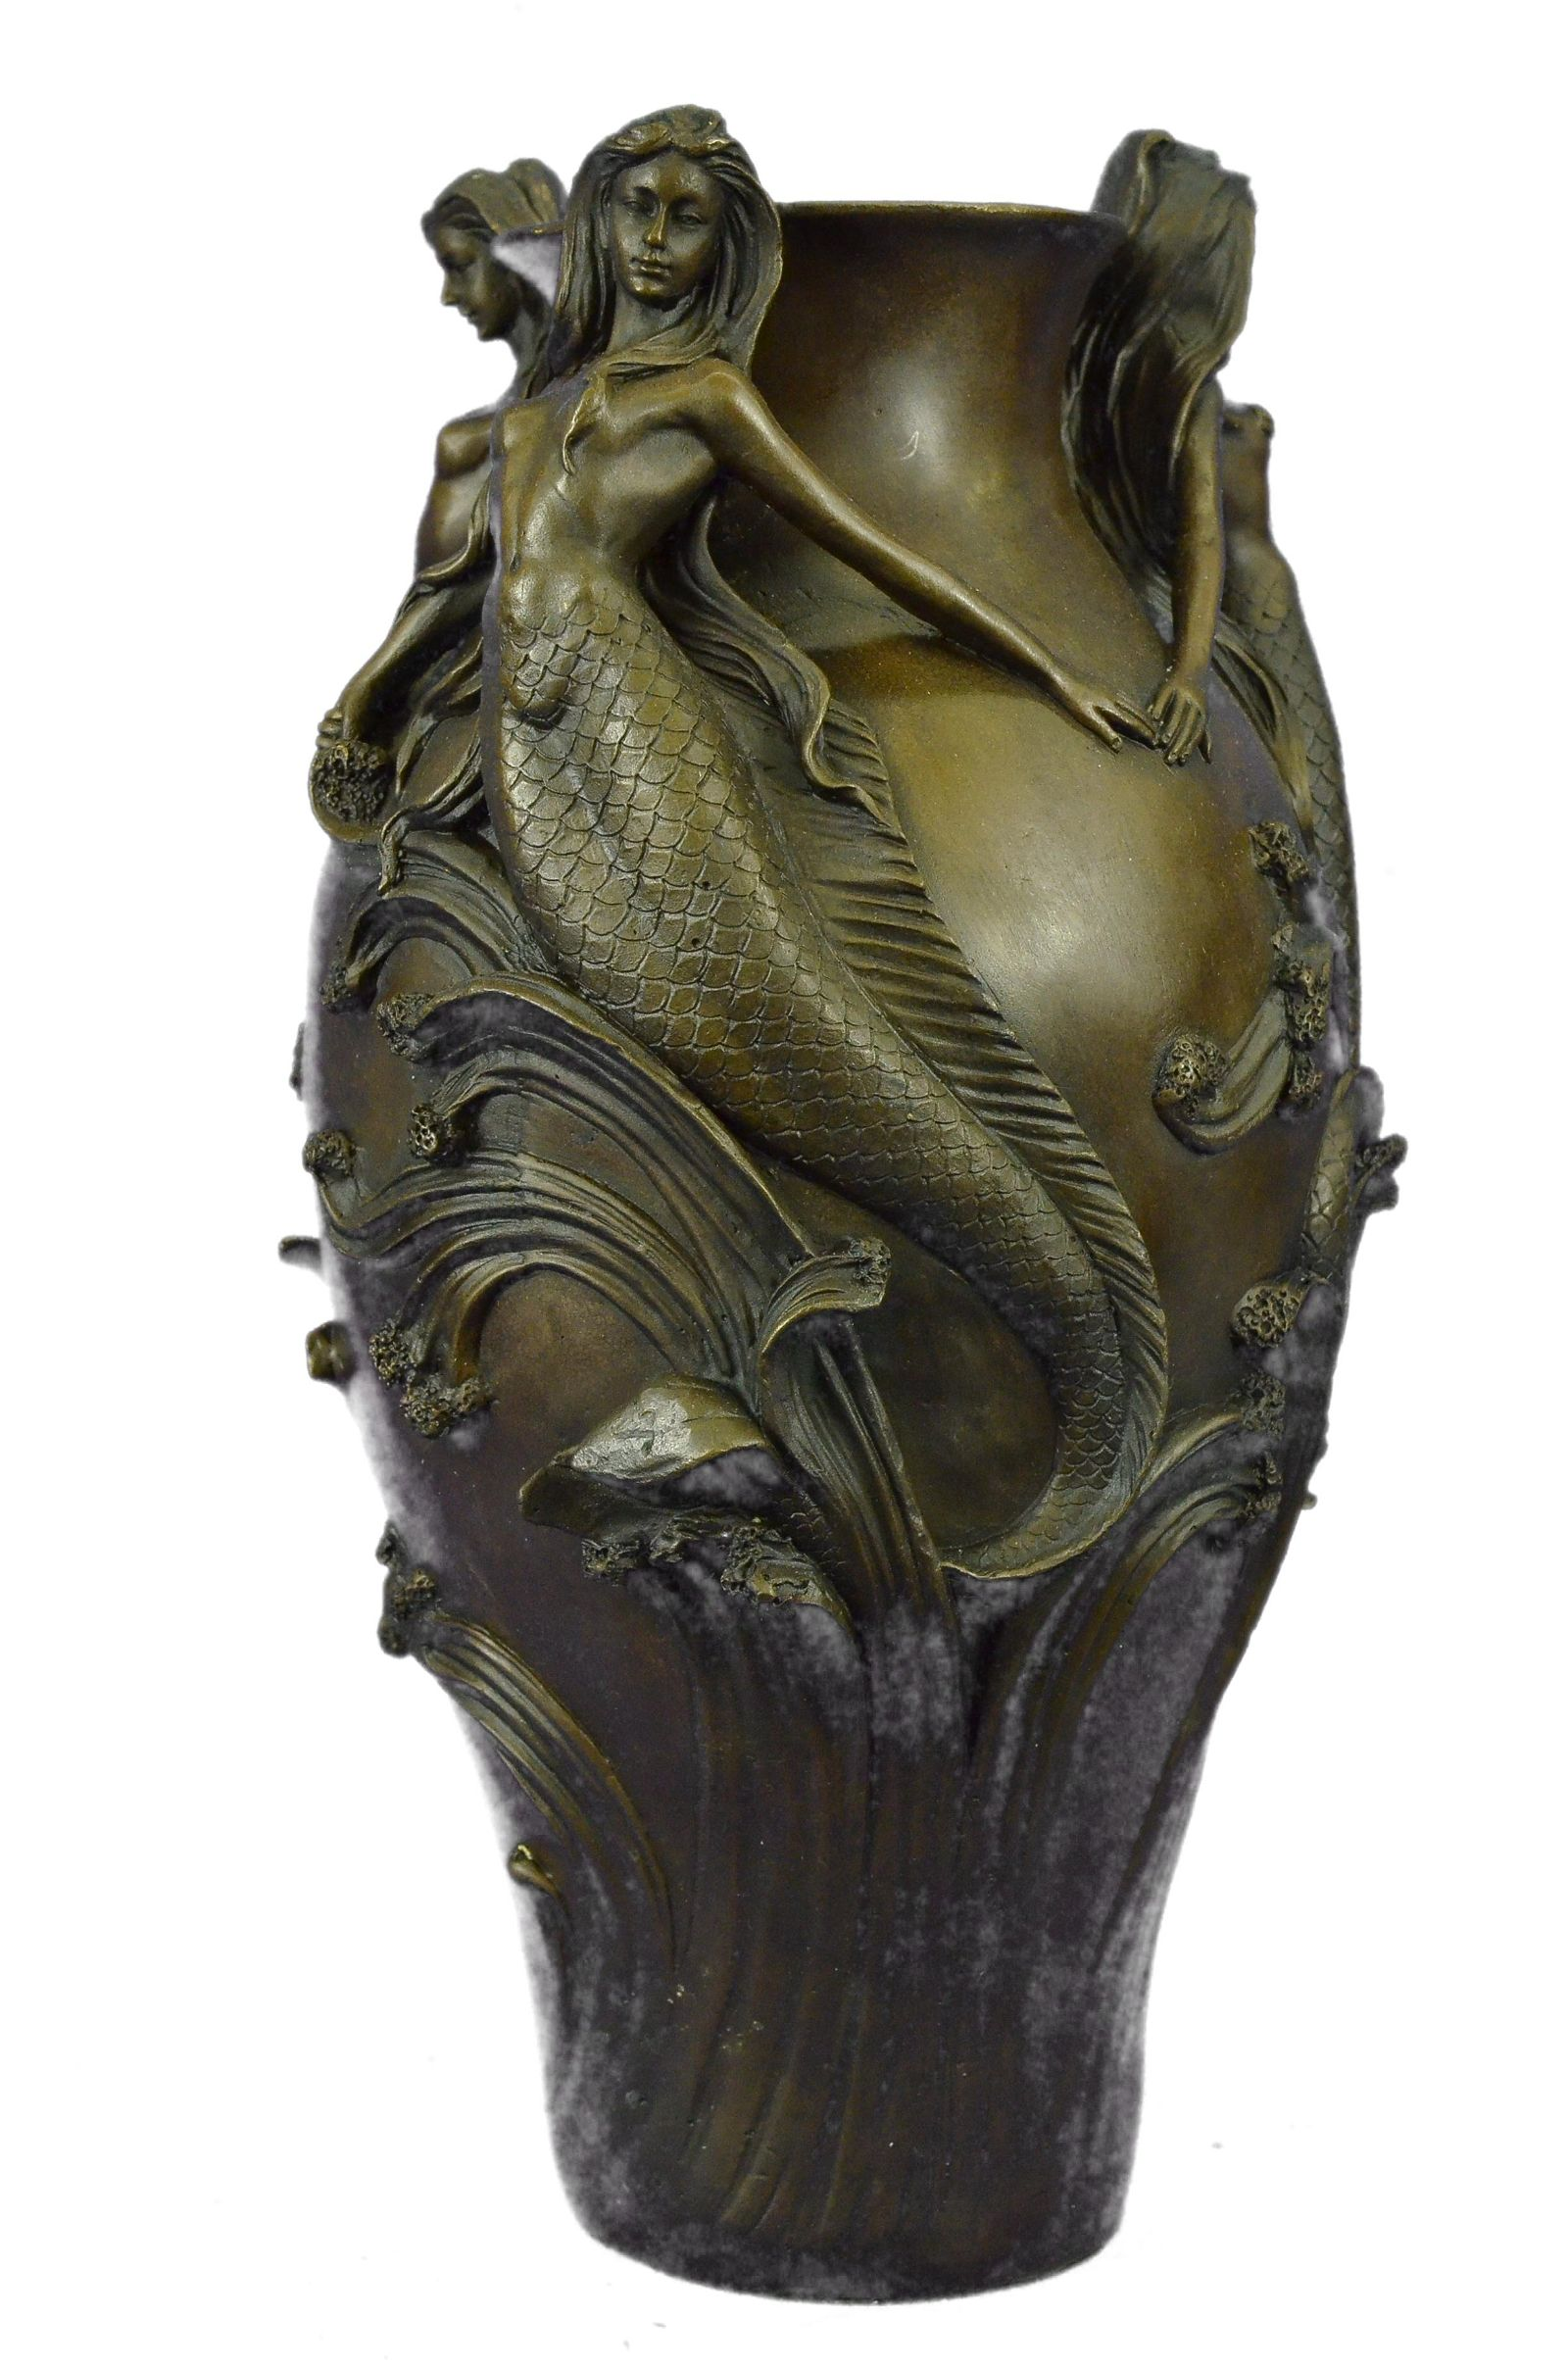 Three Beautiful Mermaids Flower Vase Bronze Sculpture